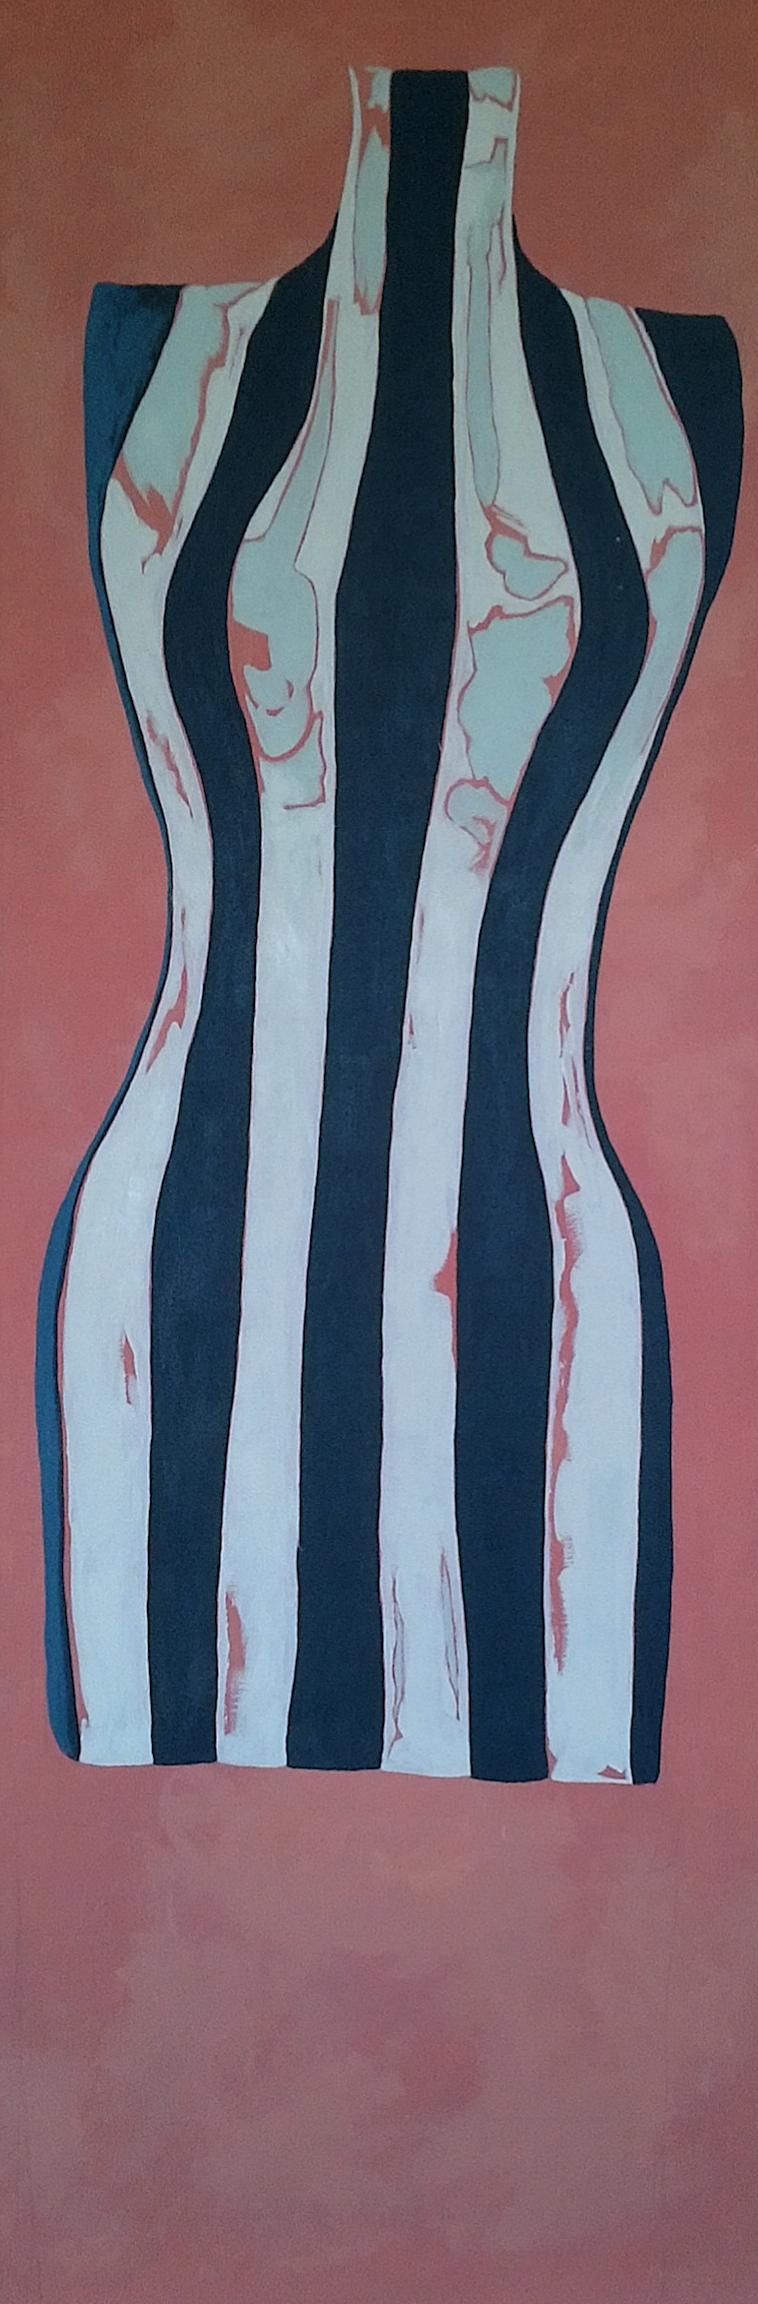 dressmakerform5b.jpg